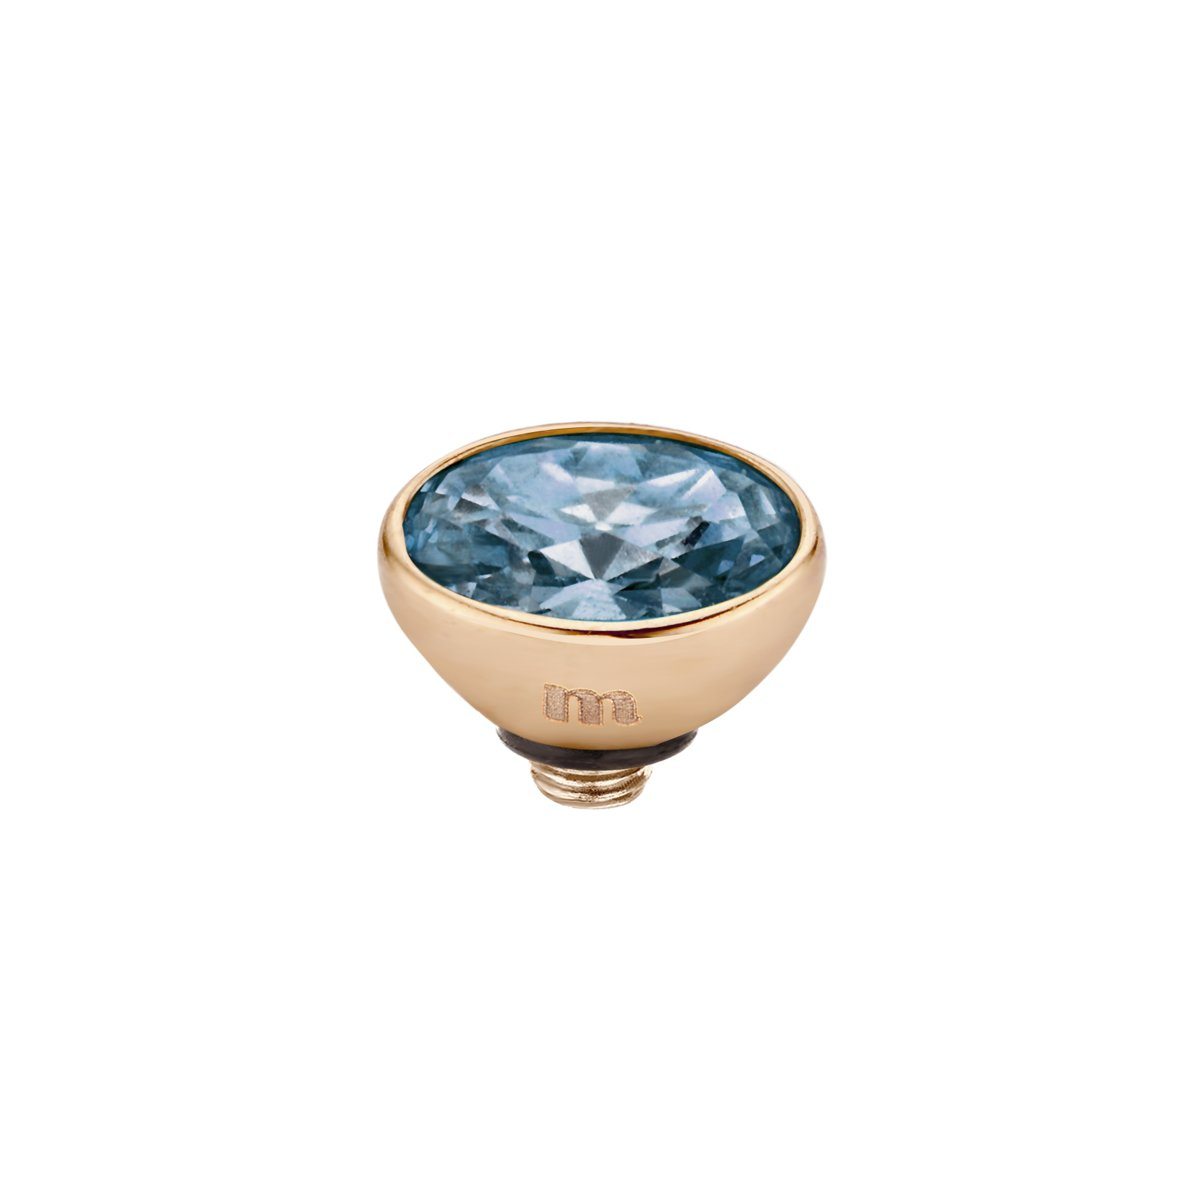 Melano twisted oval cz steentje - midnight - dames - rosekleurig - 5mm kopen